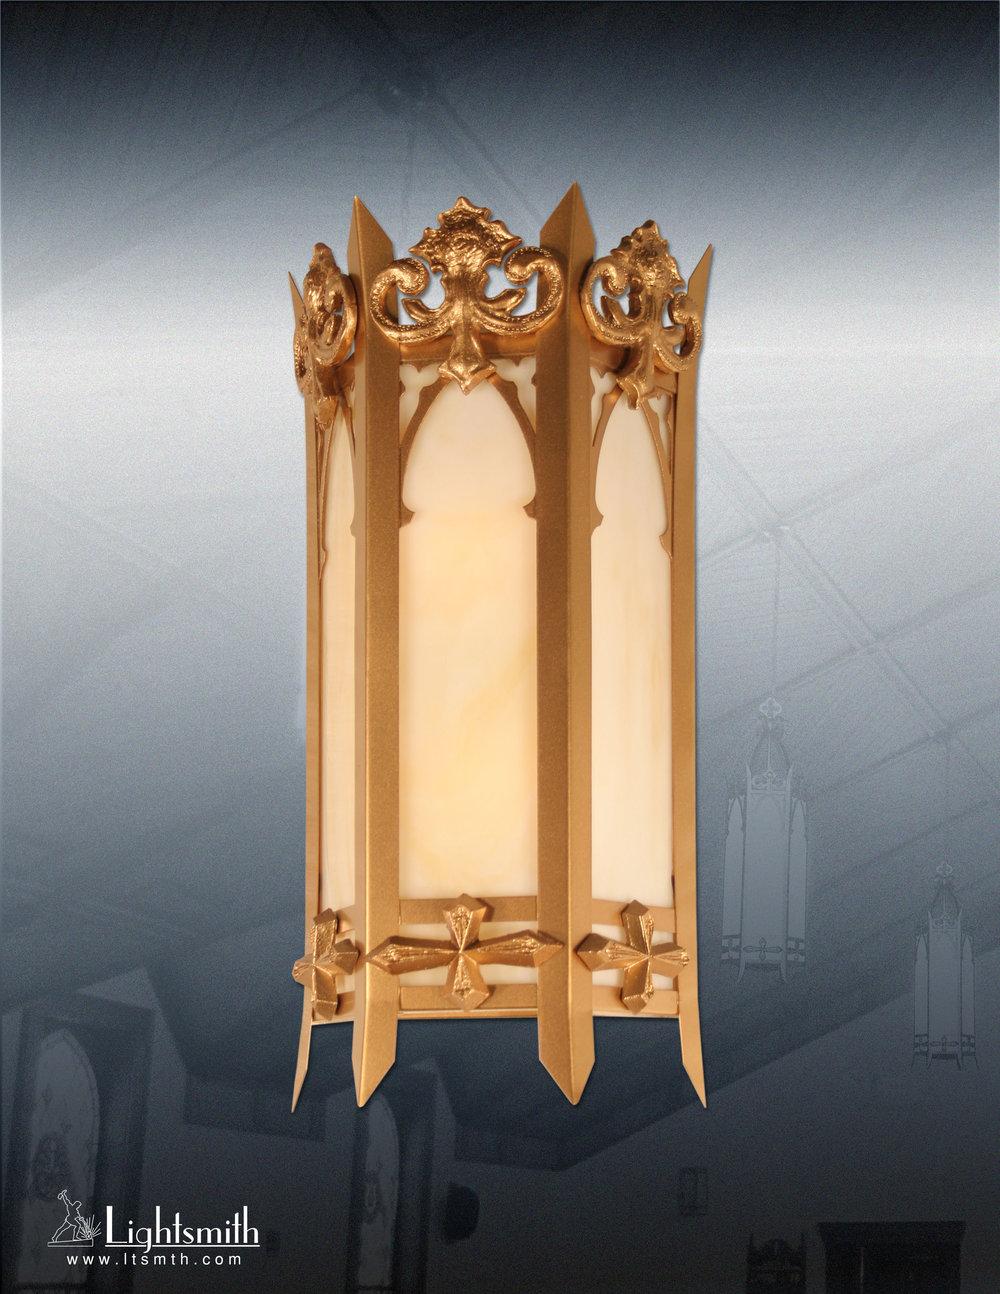 812-WT - Light Bronze - Streaked Opal Glass